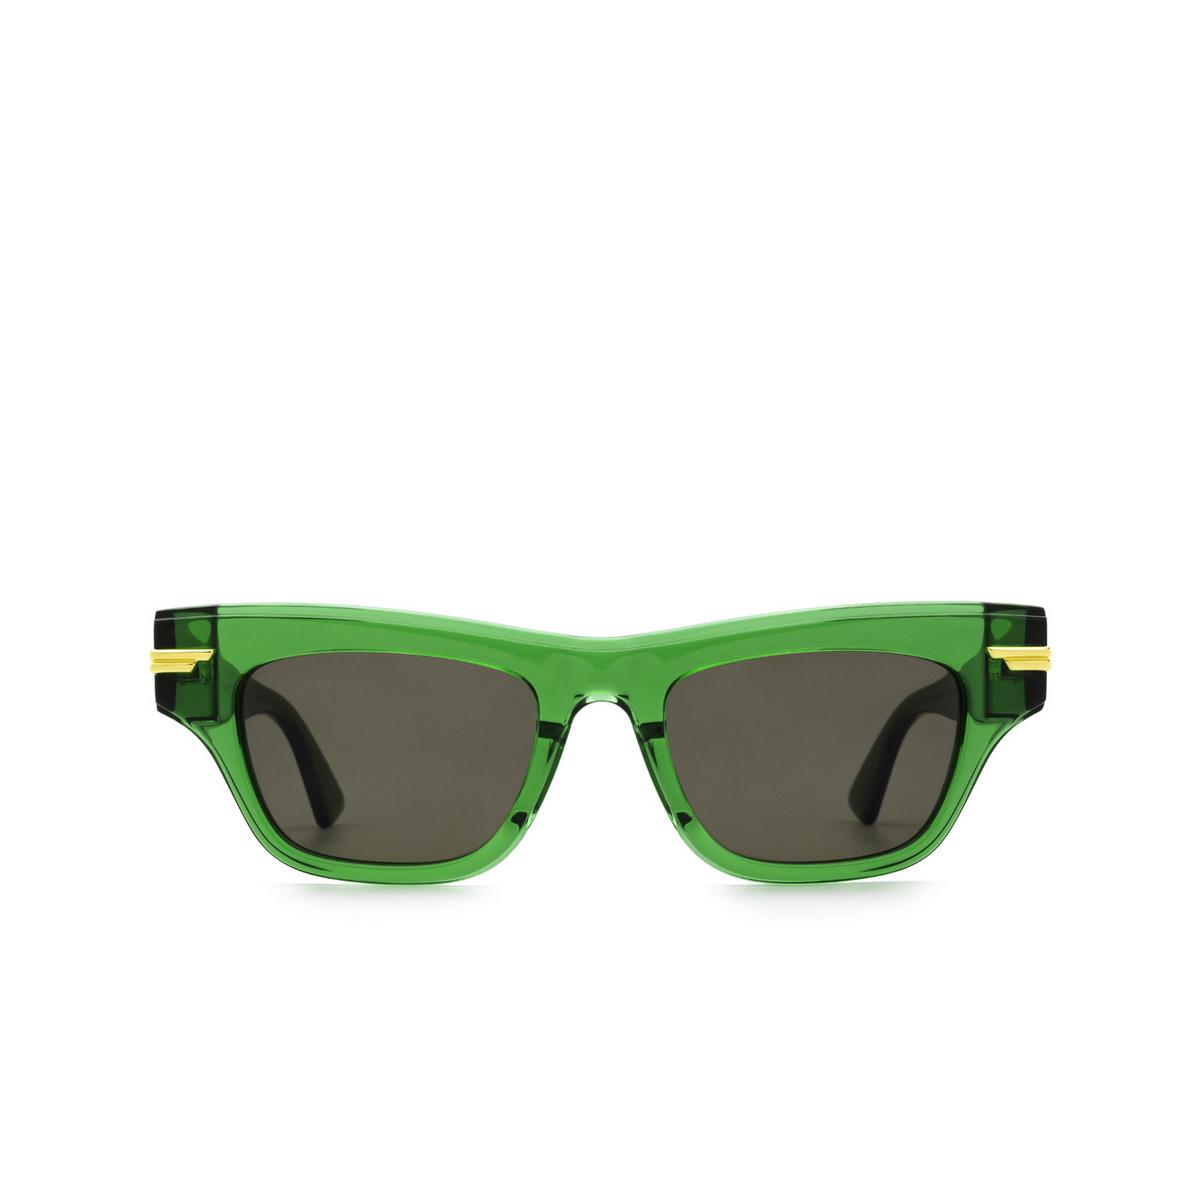 Bottega Veneta® Cat-eye Sunglasses: BV1122S color Green 004 - front view.